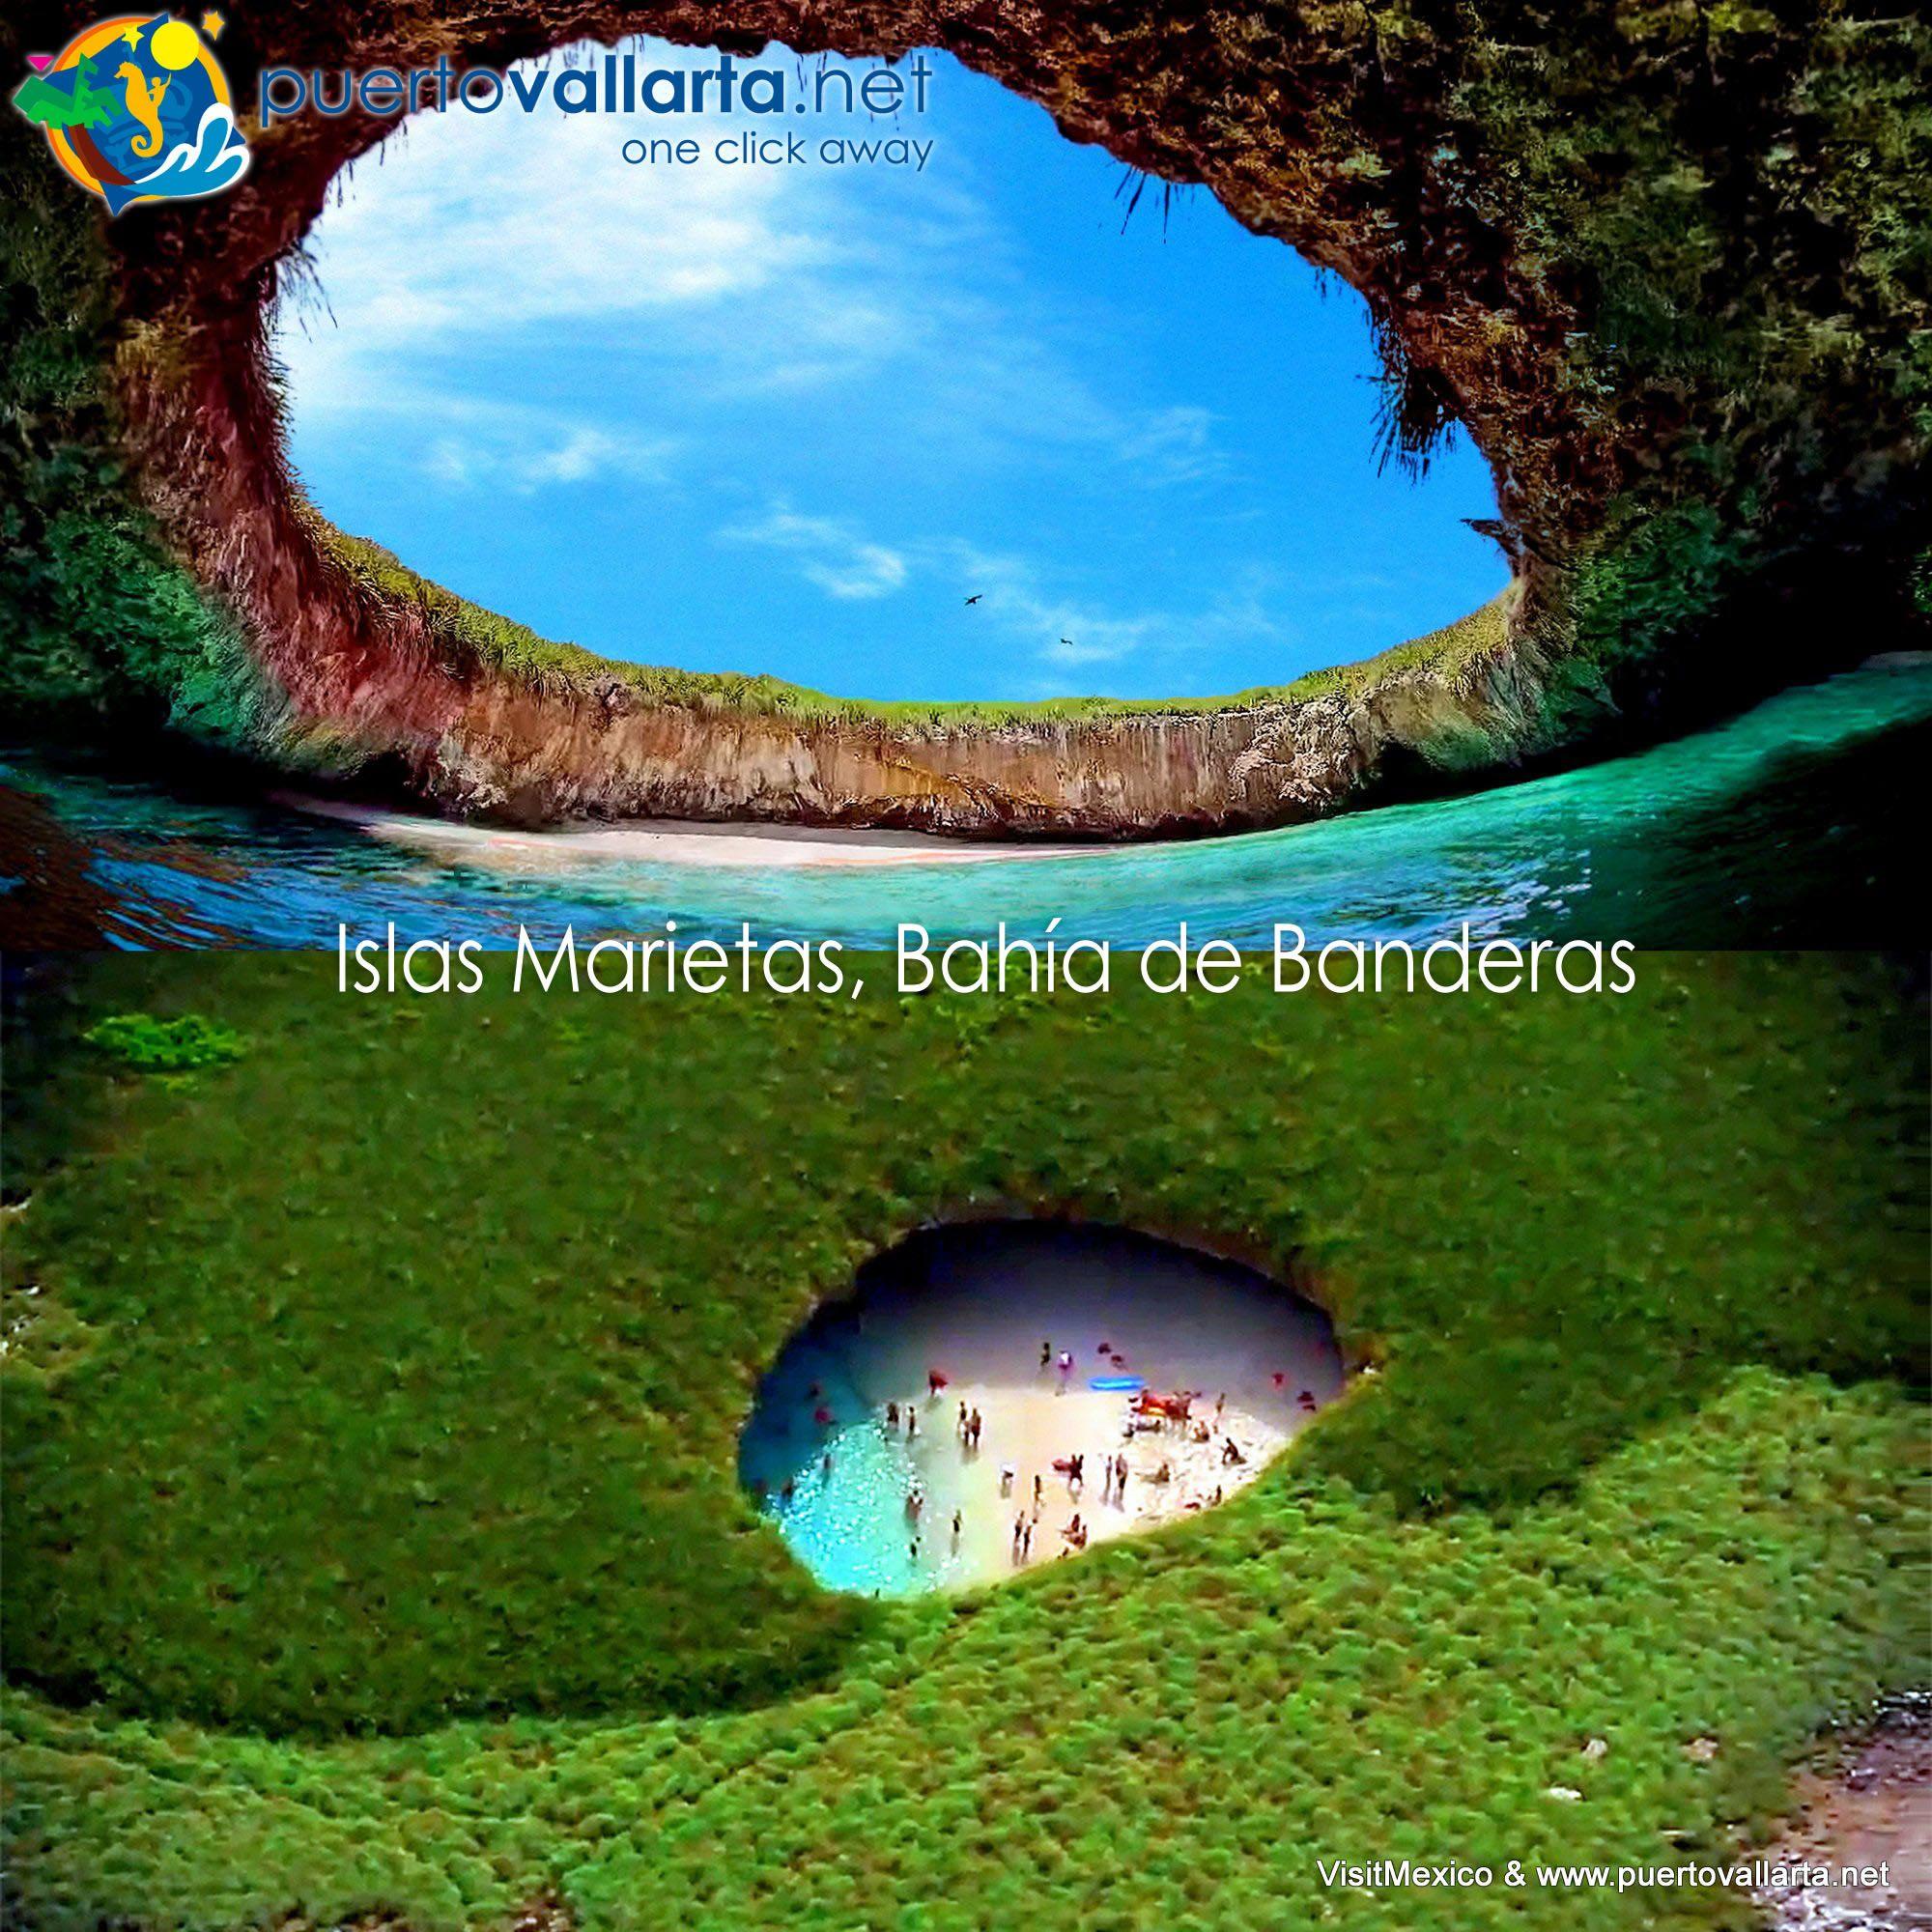 Marieta-Islands-new-02.jpg 2,000×2,000픽셀